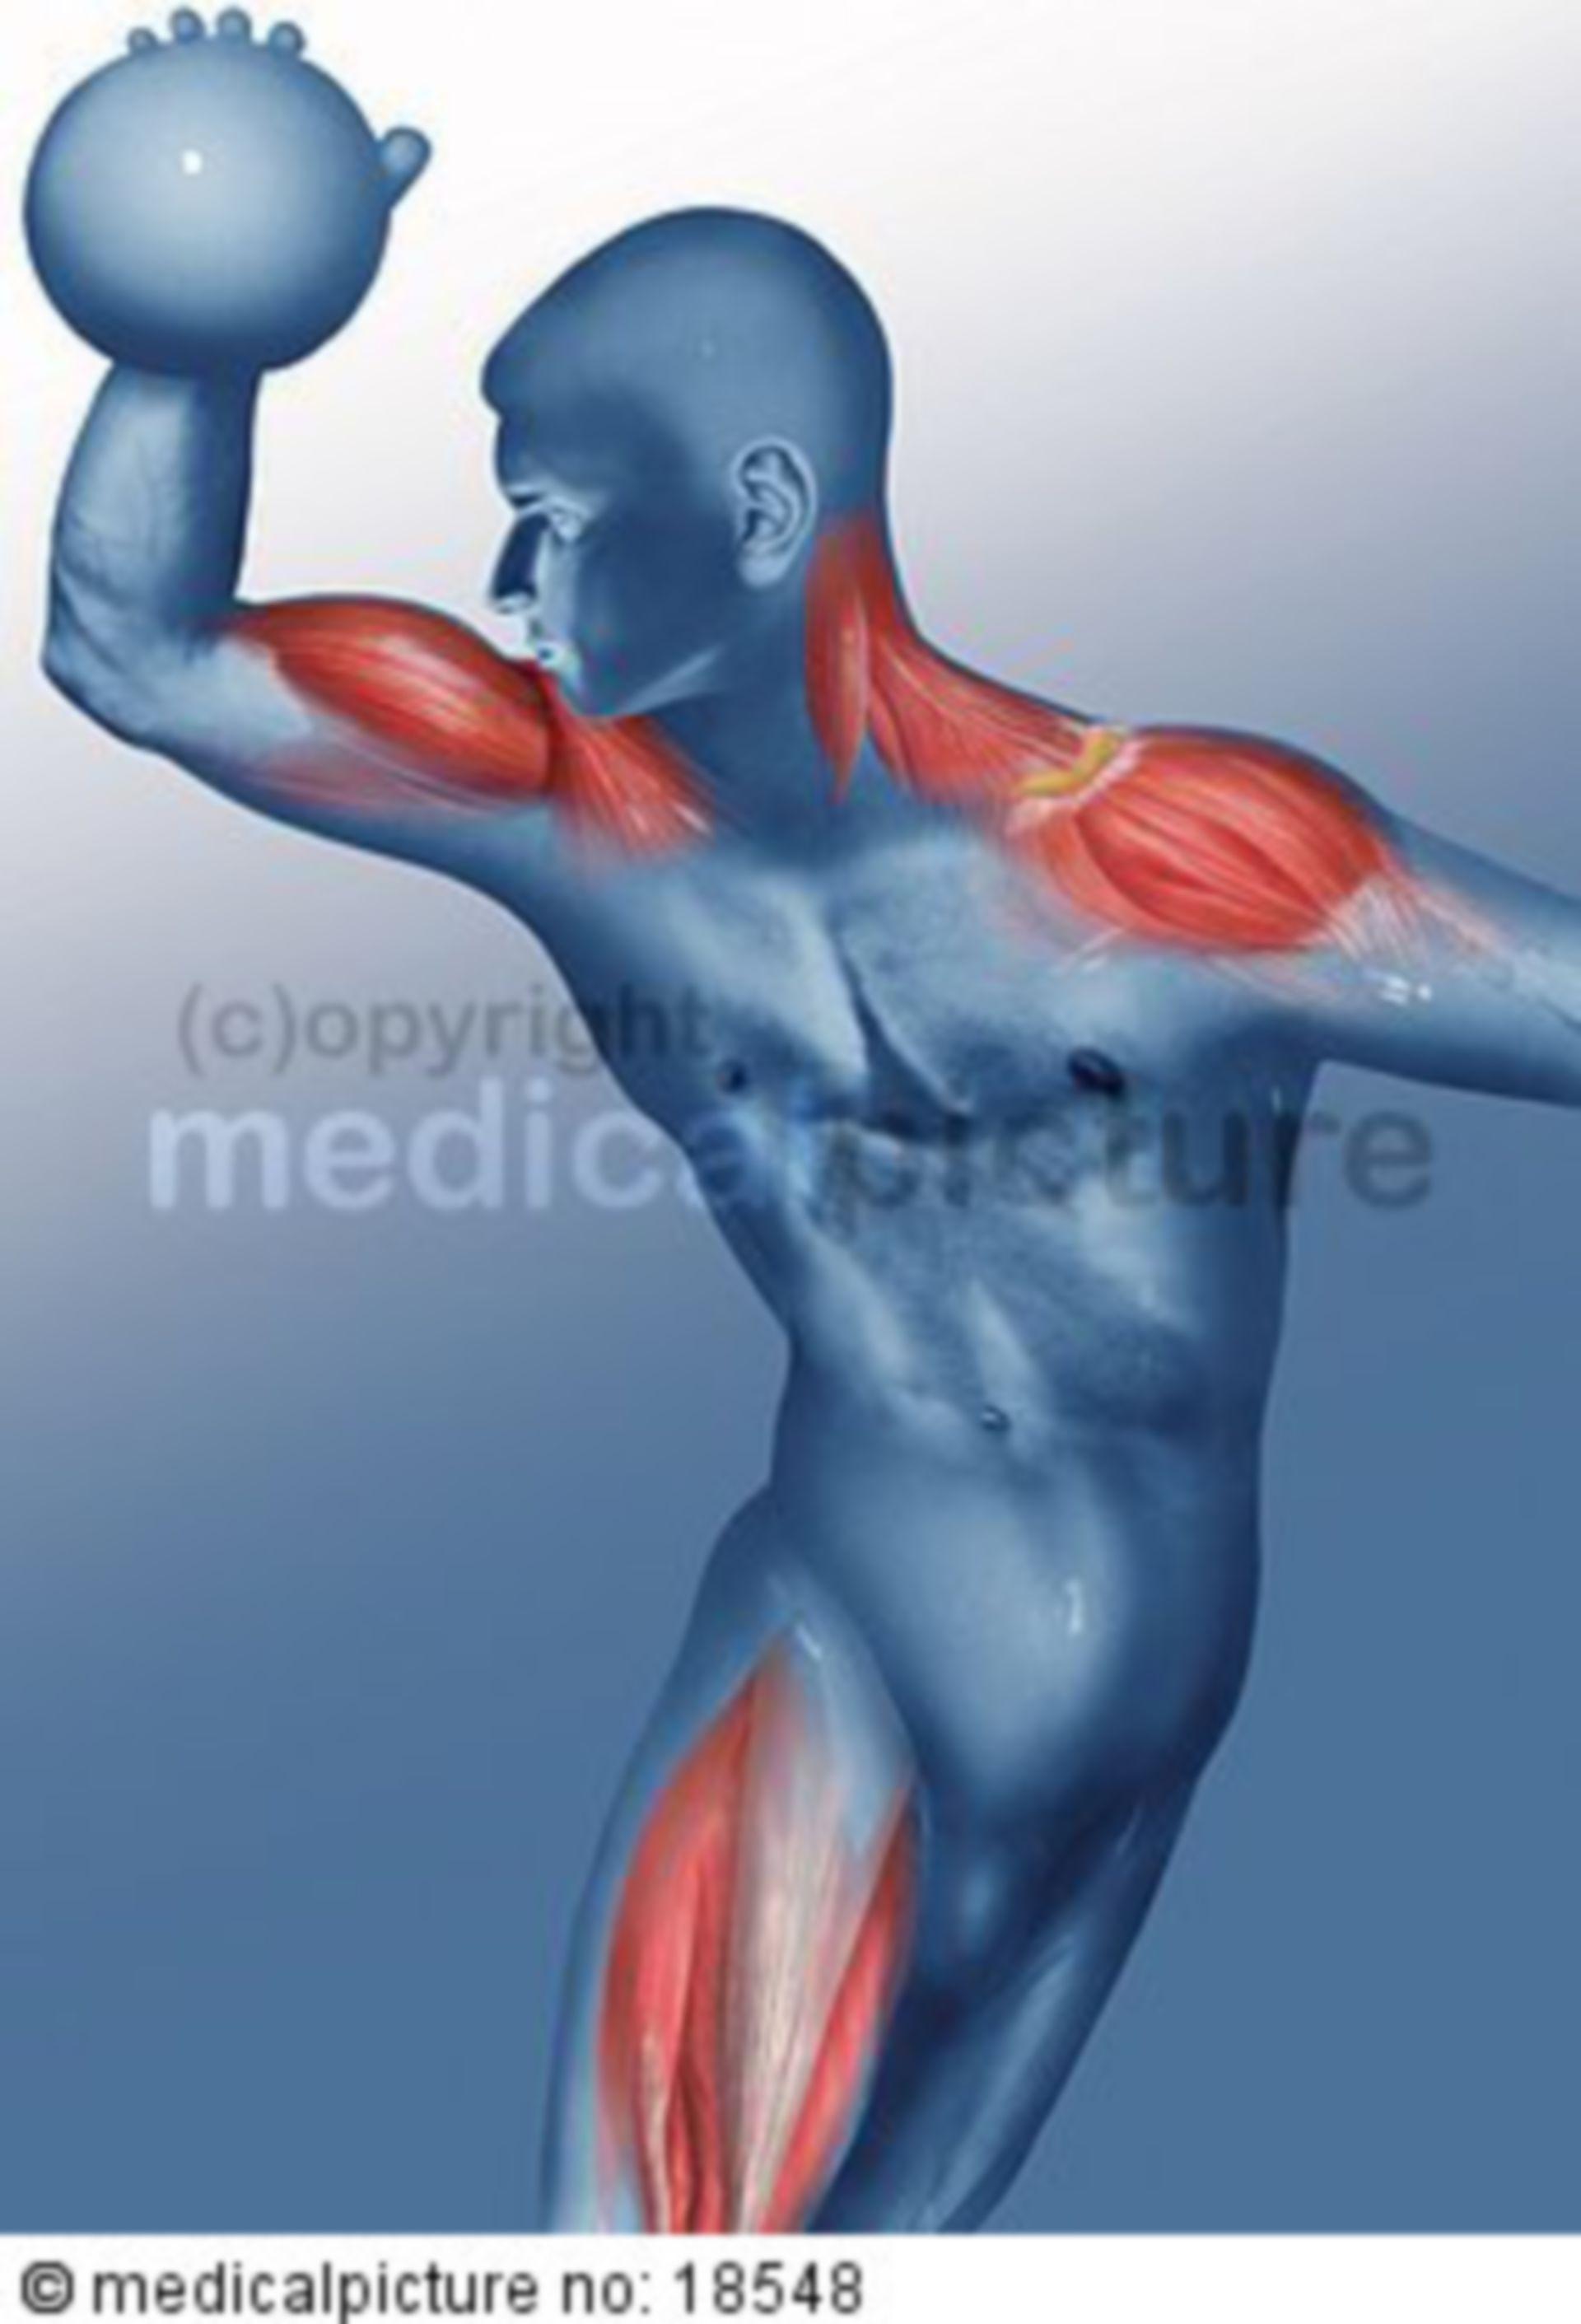 Muscles used playing handball